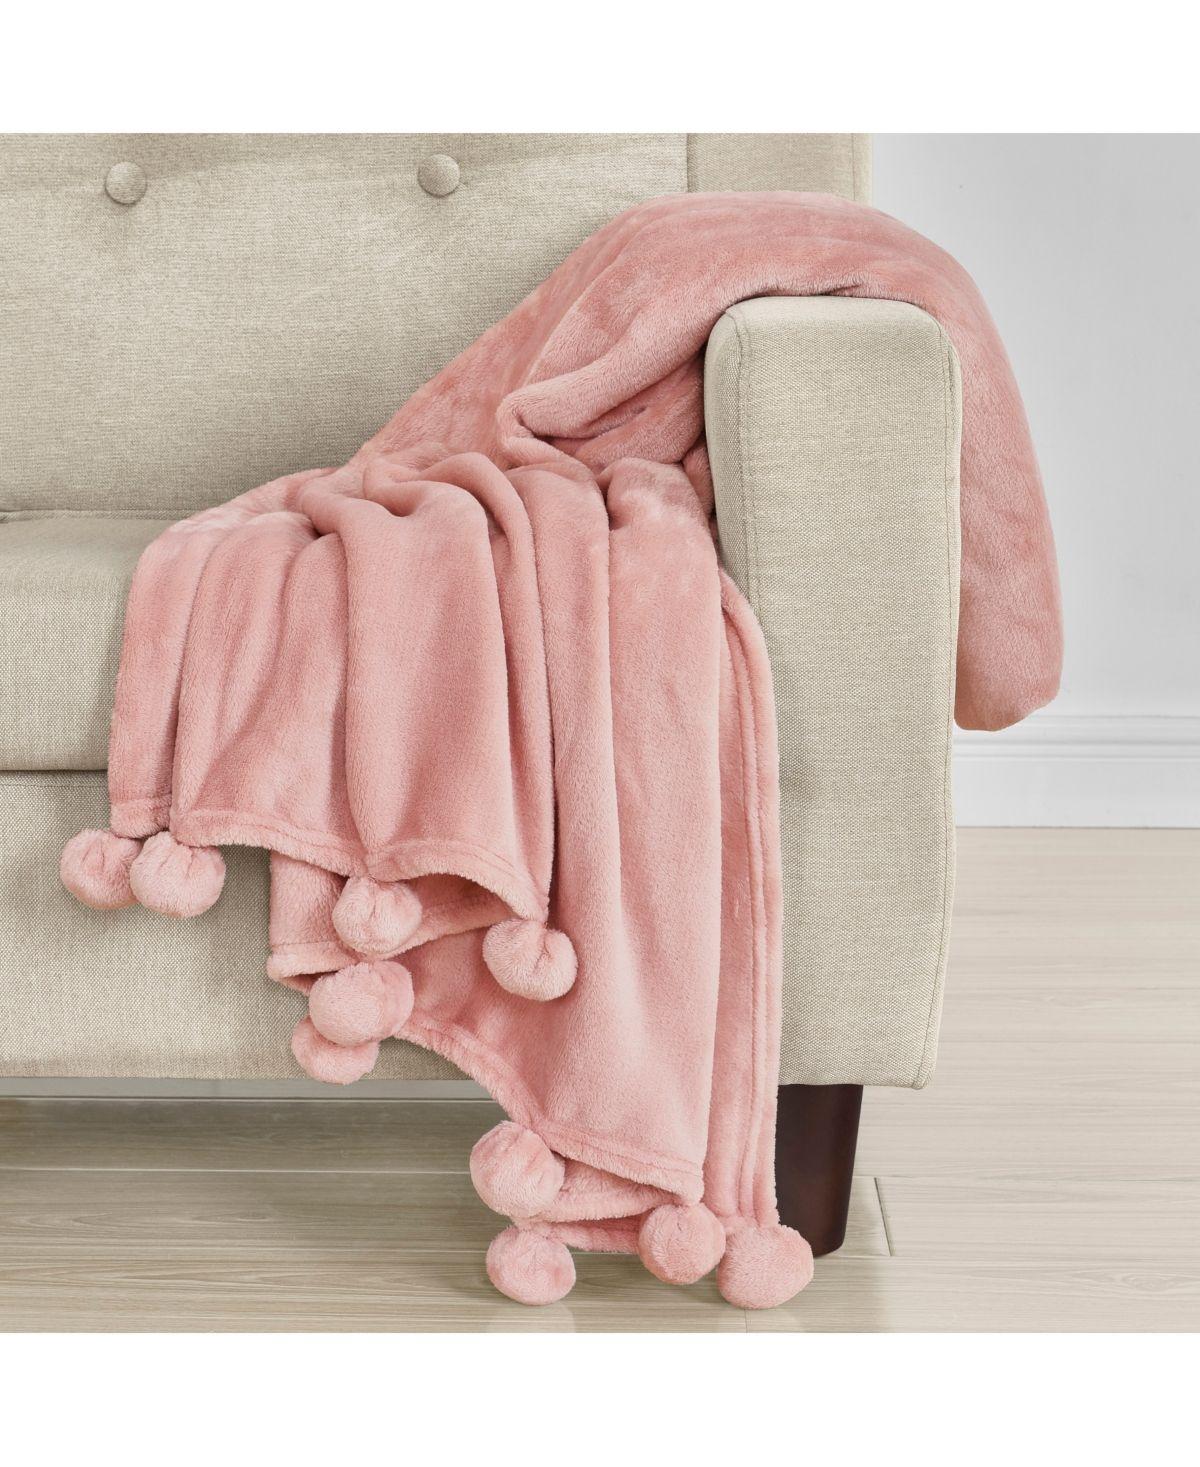 J By J Queen Paulina Throw Pink In 2020 Bed Throws Pink Throw Blanket Pink Blanket